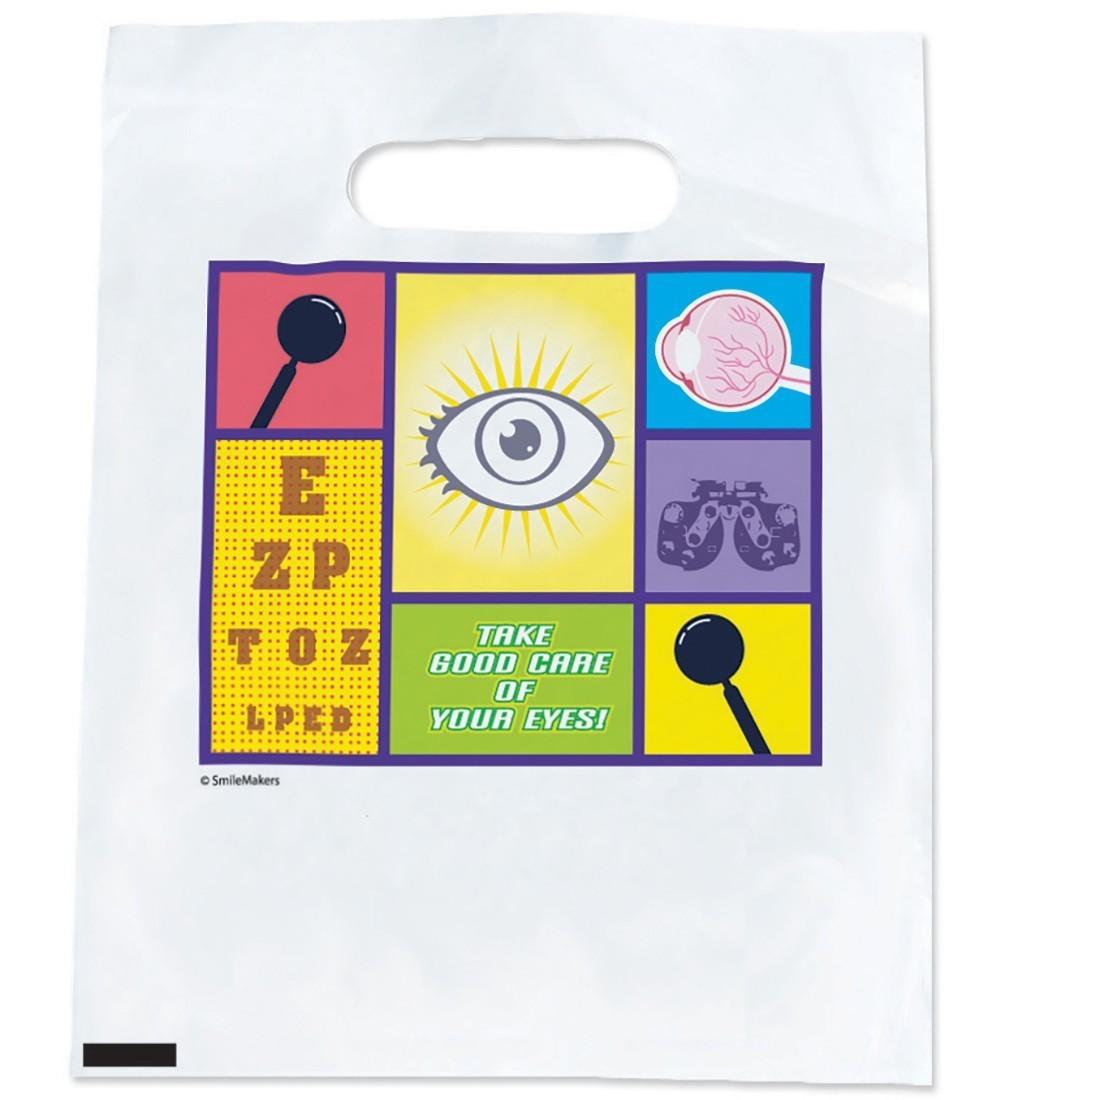 Eye Care Bags                                      [image]